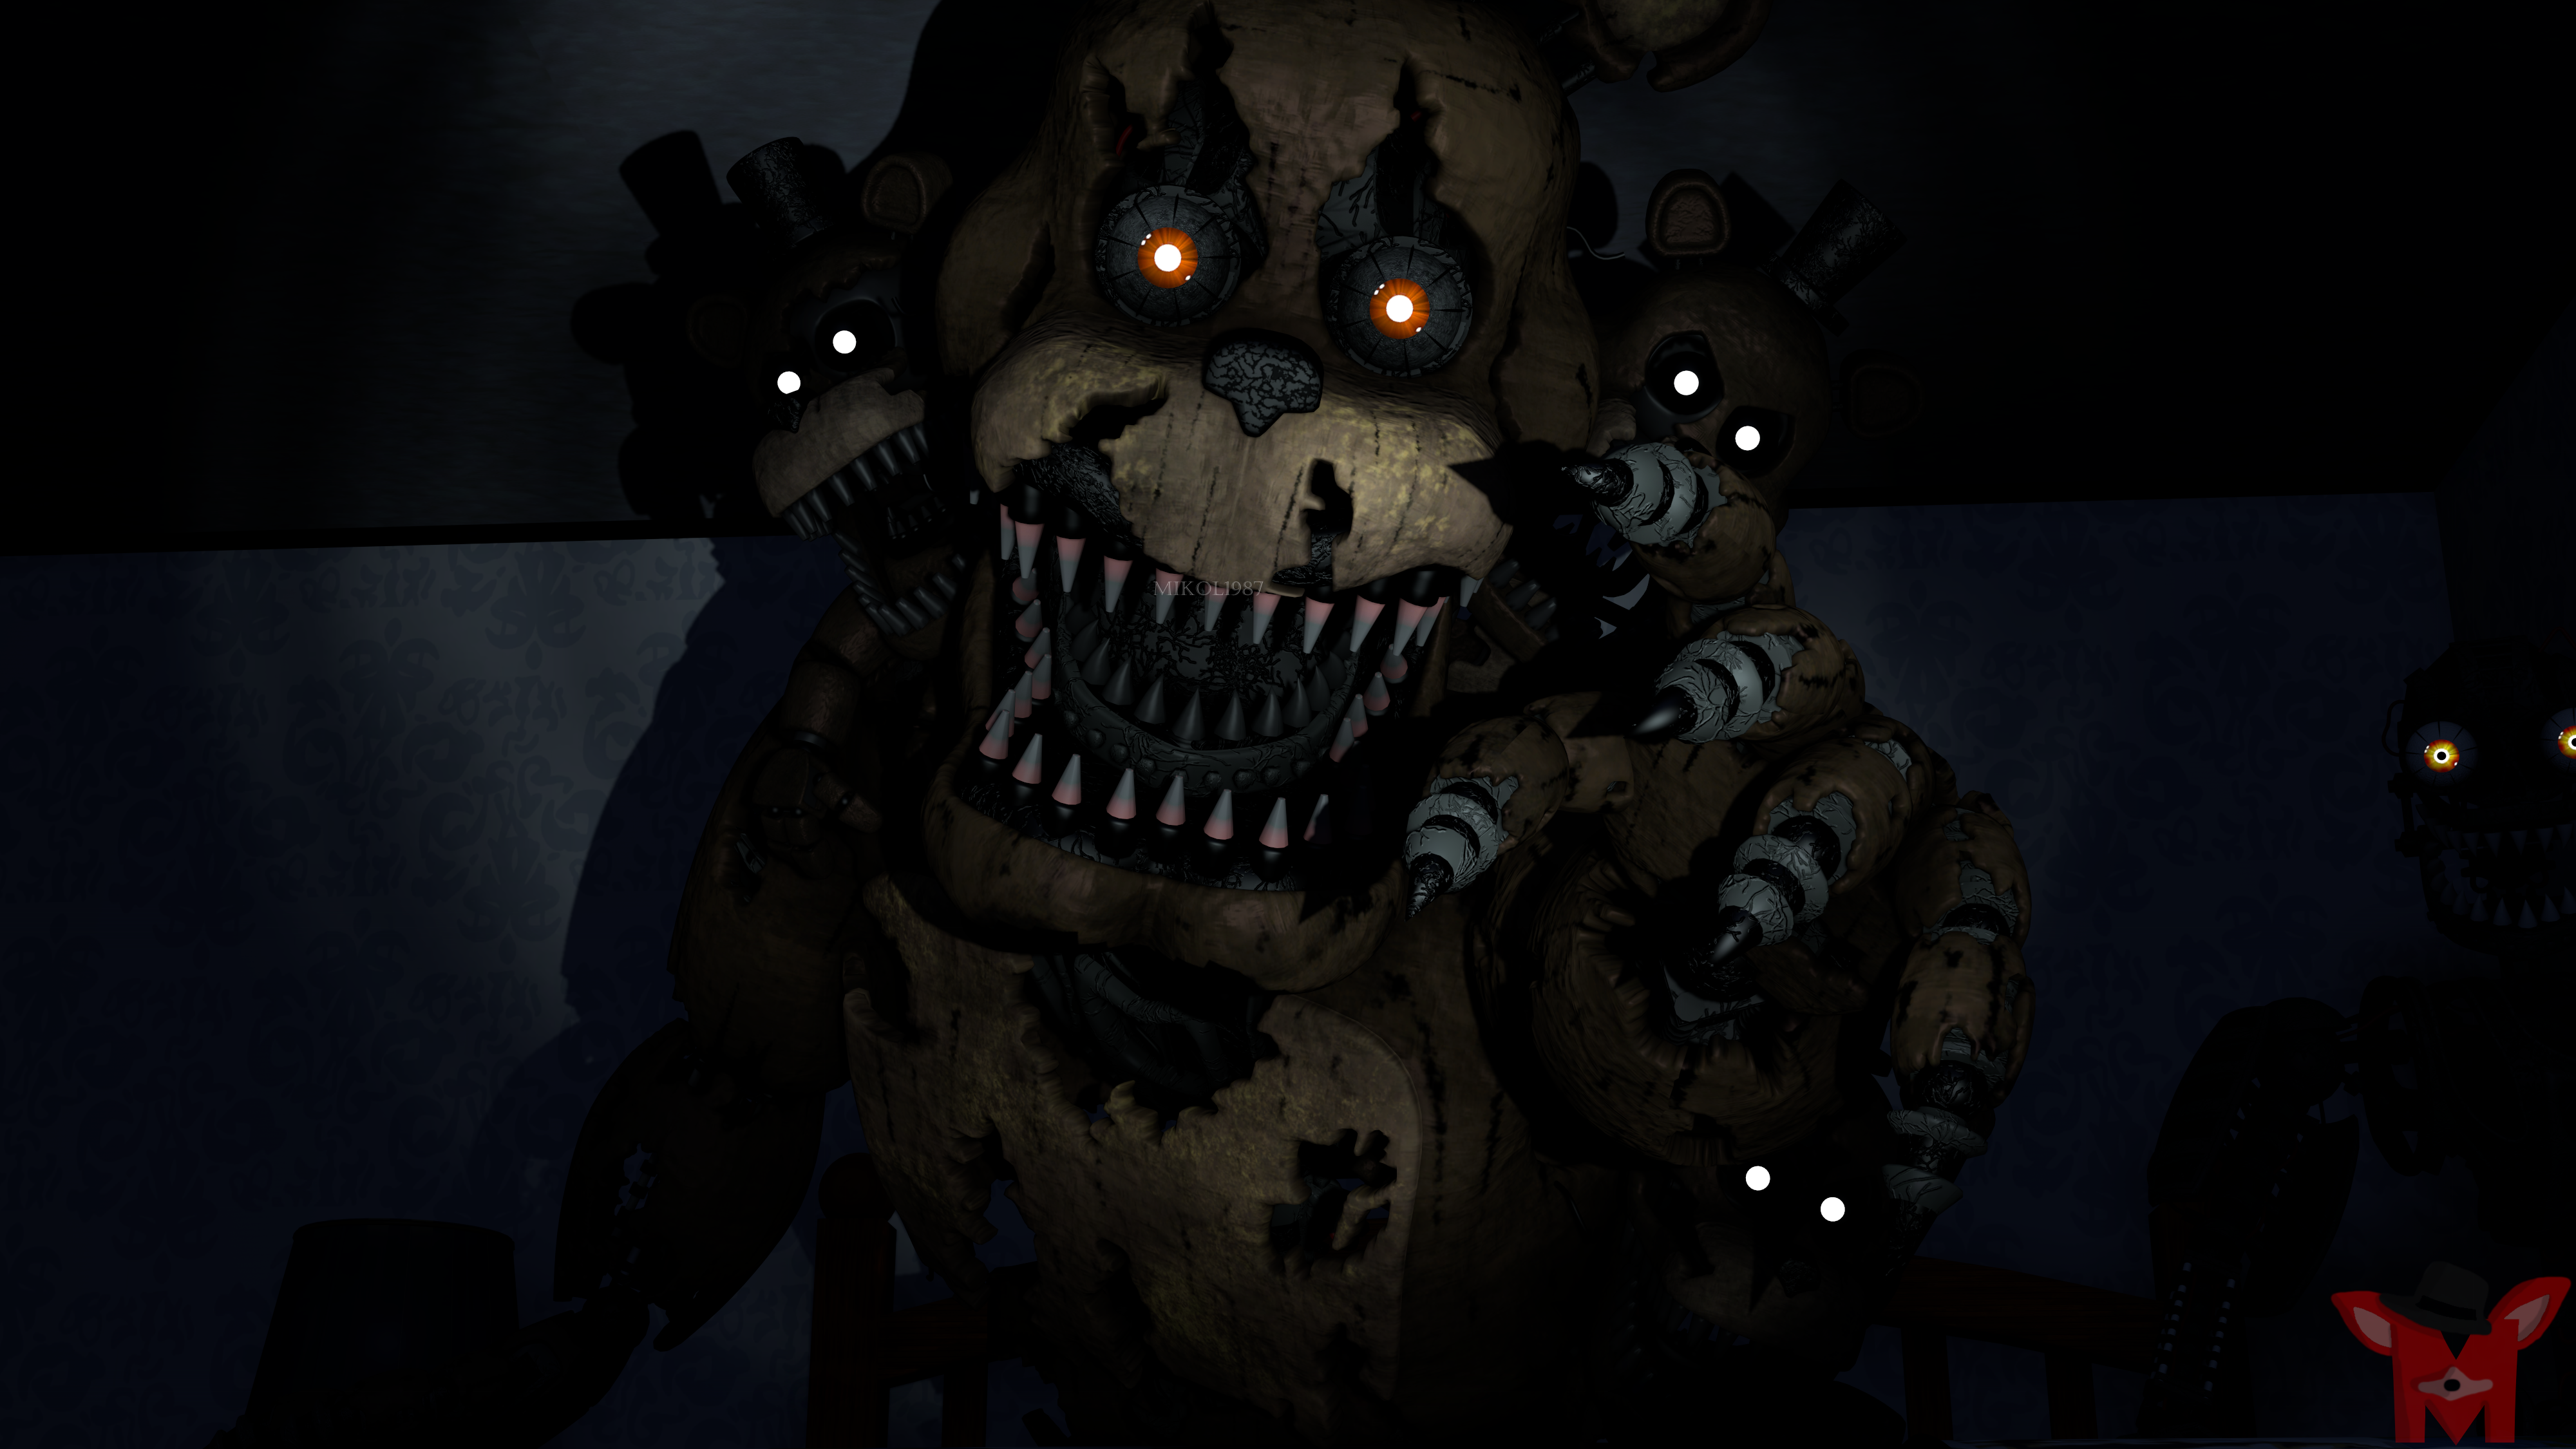 подтвердило, картинки с кашмарами что